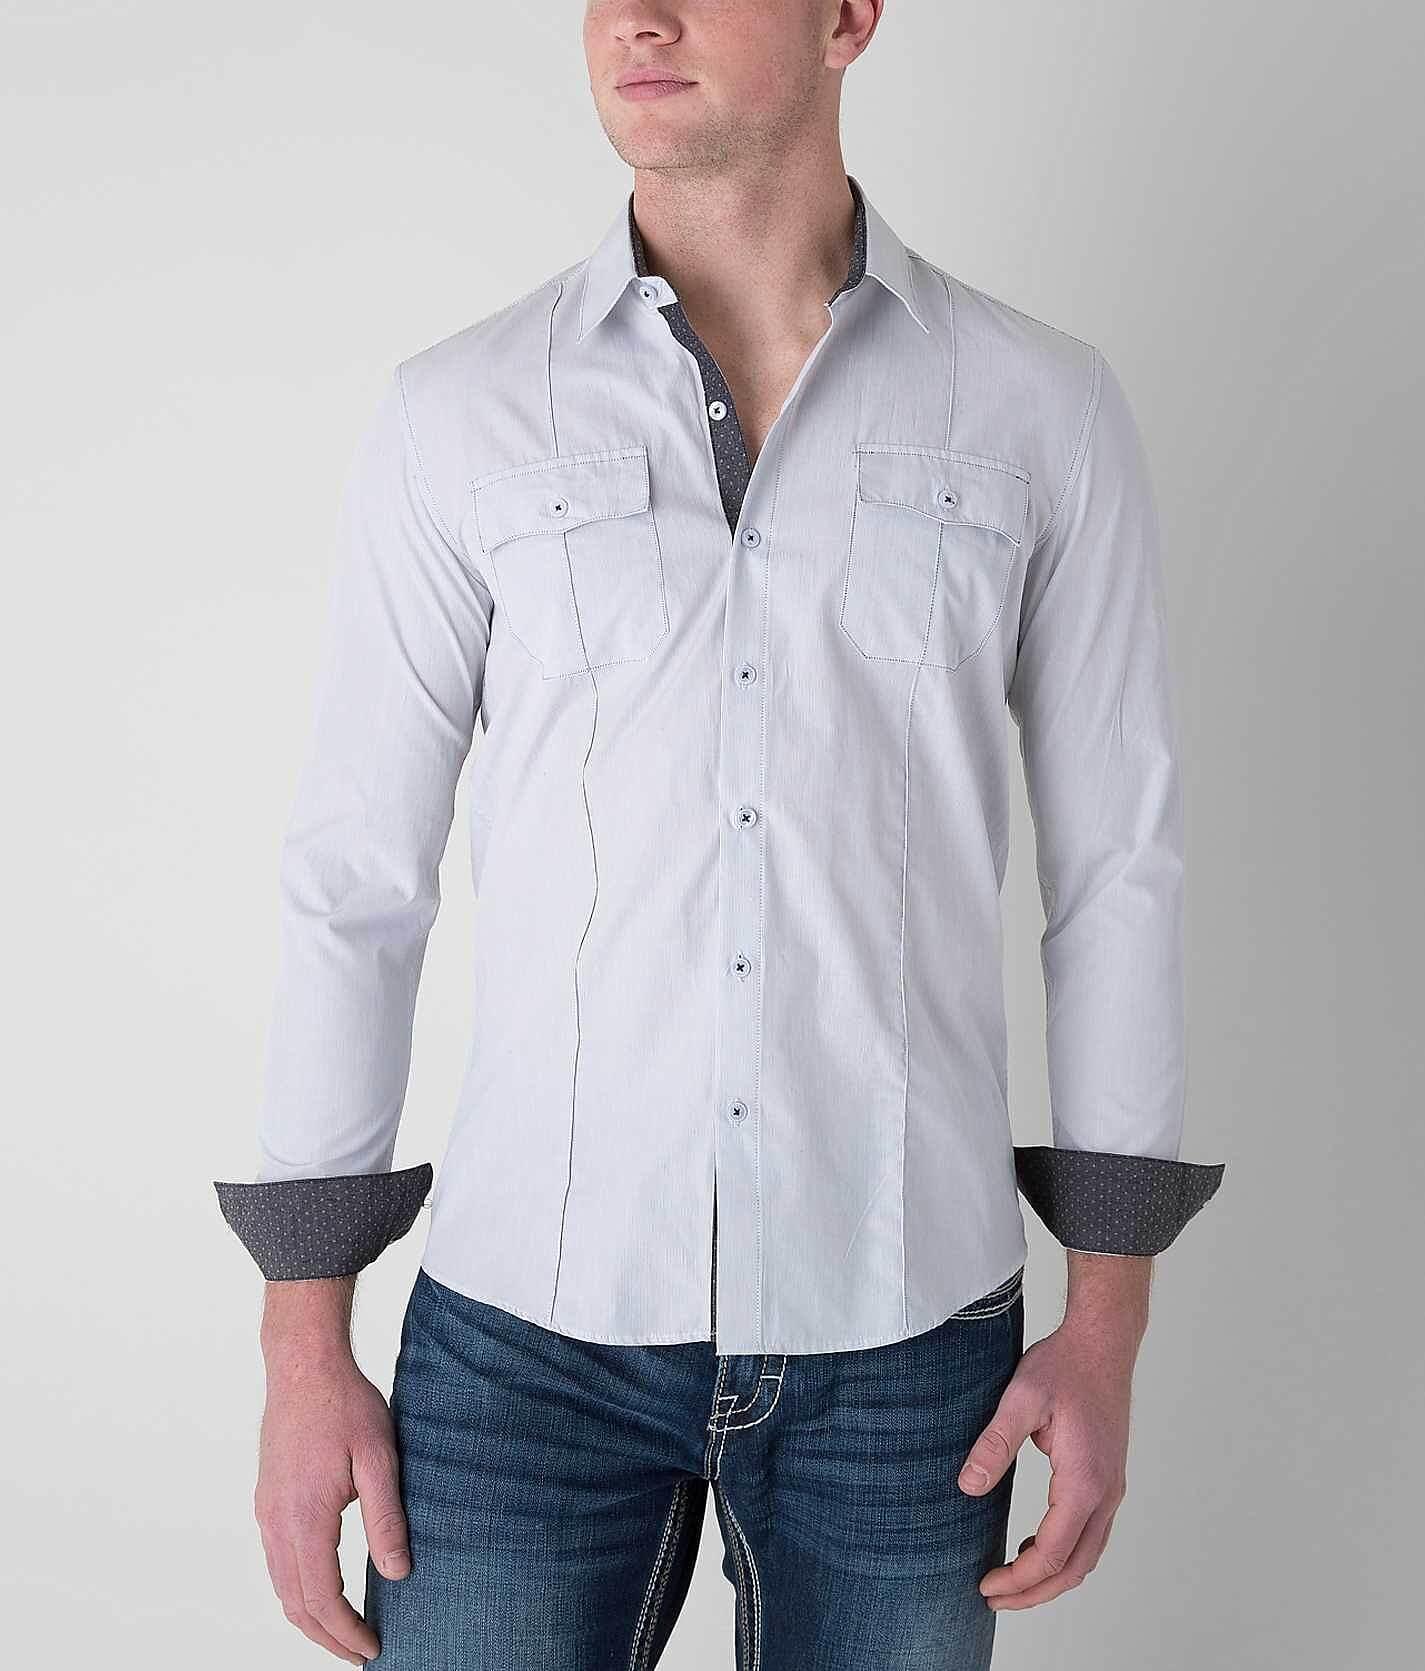 7Diamonds Lost Stars Shirt